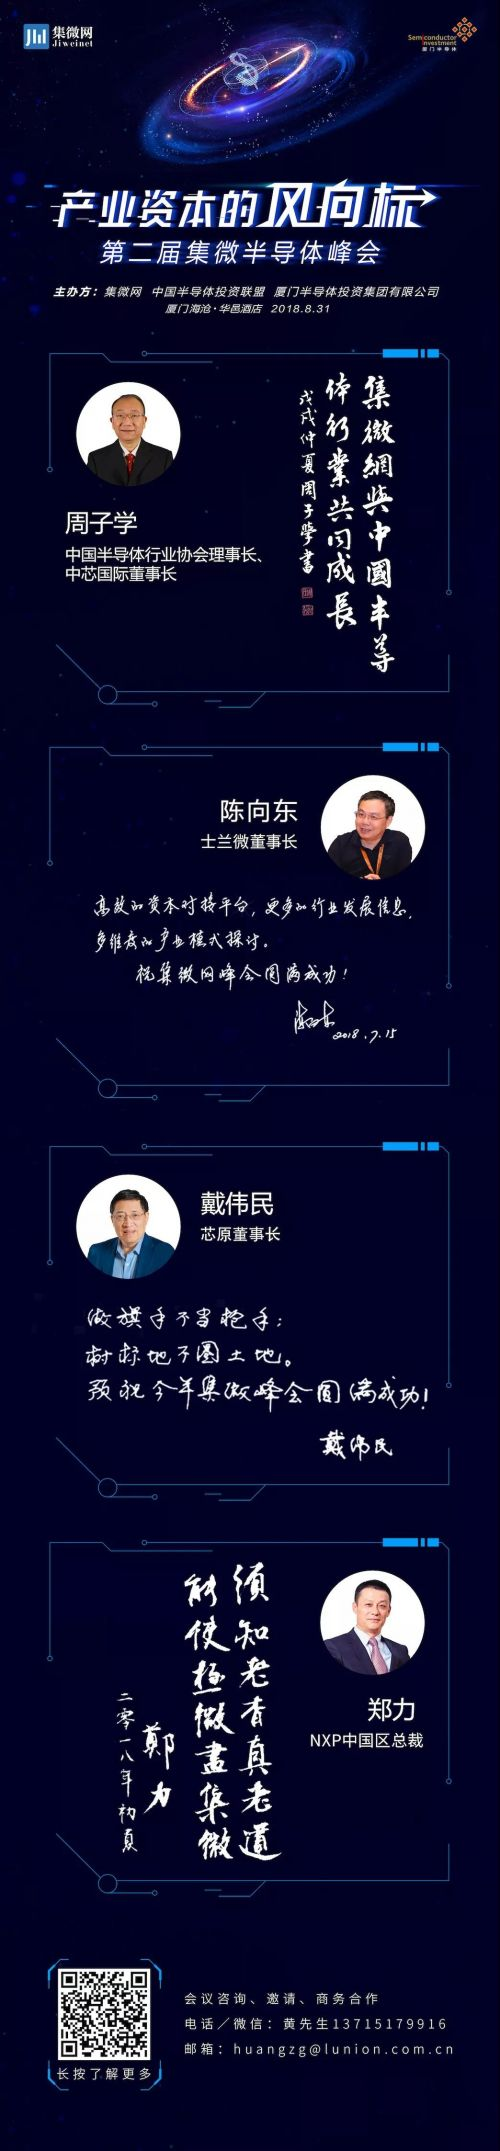 Arm吴雄昂、黄汪、石磊、张世龙、林永育寄语峰会14